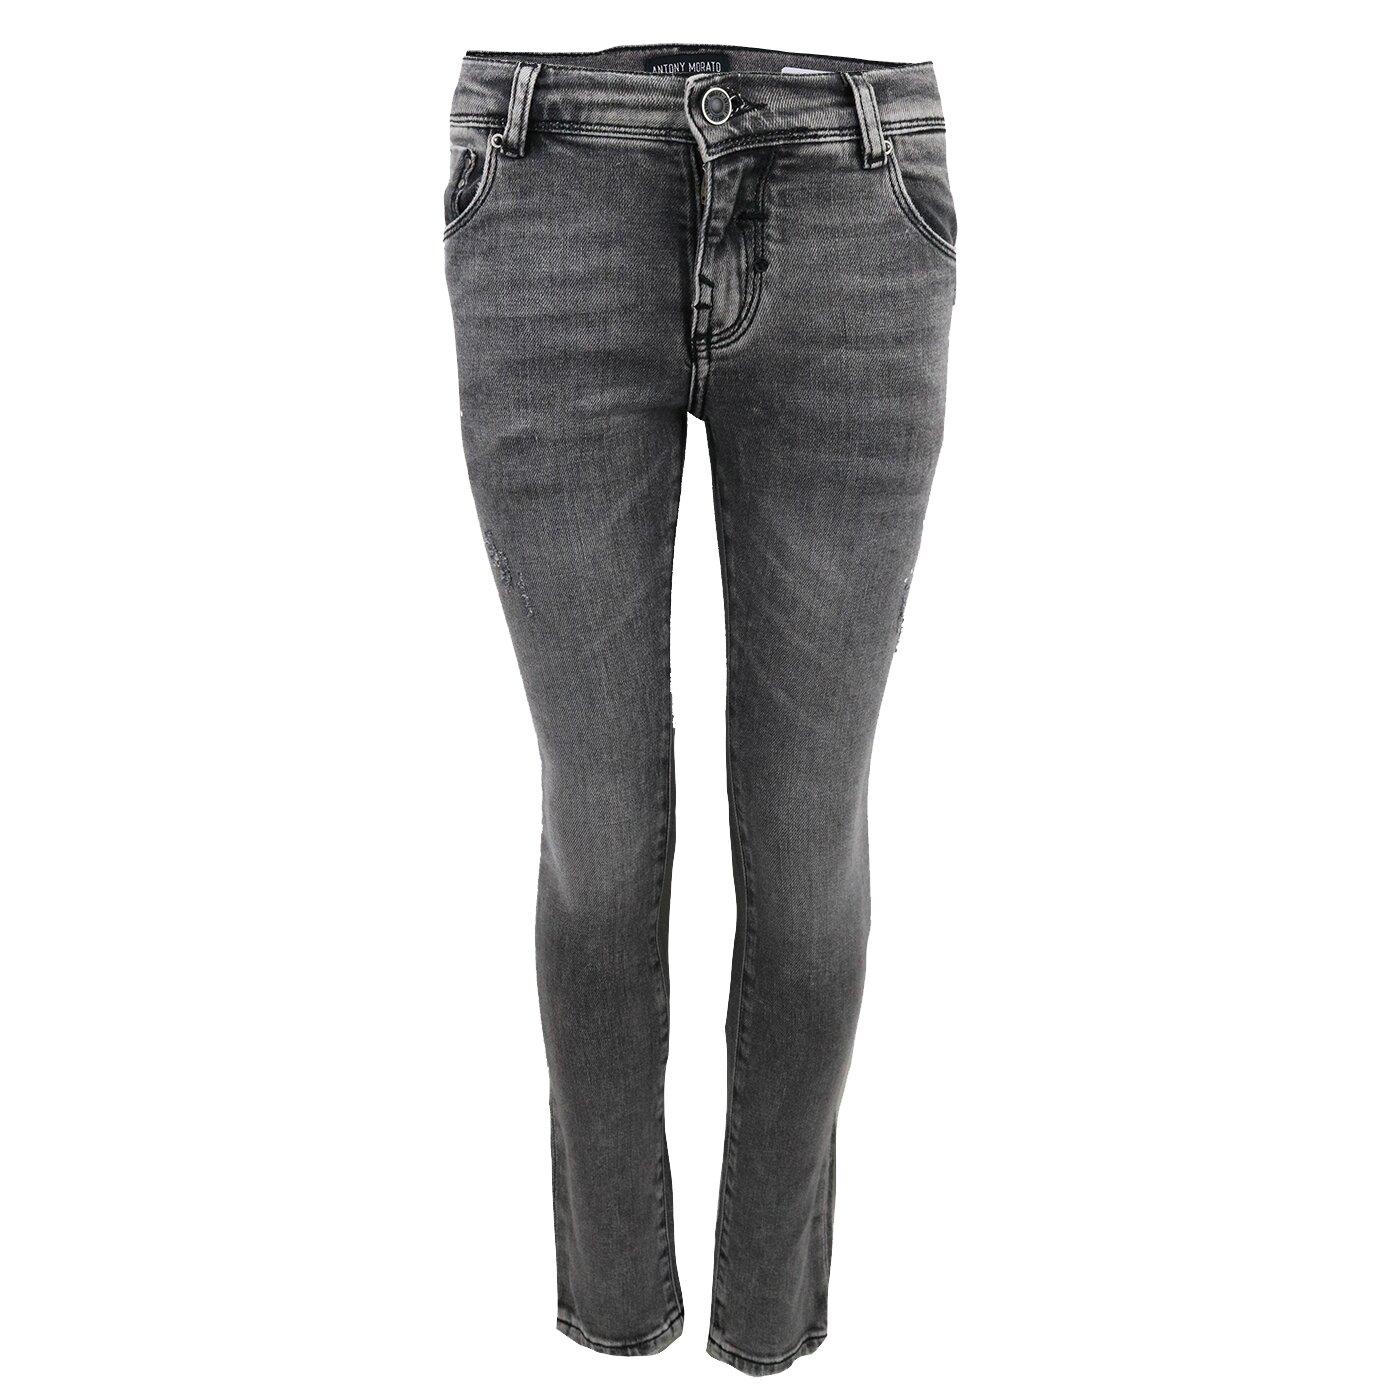 Antony Morato Fighetto Jeans Grijs 0281